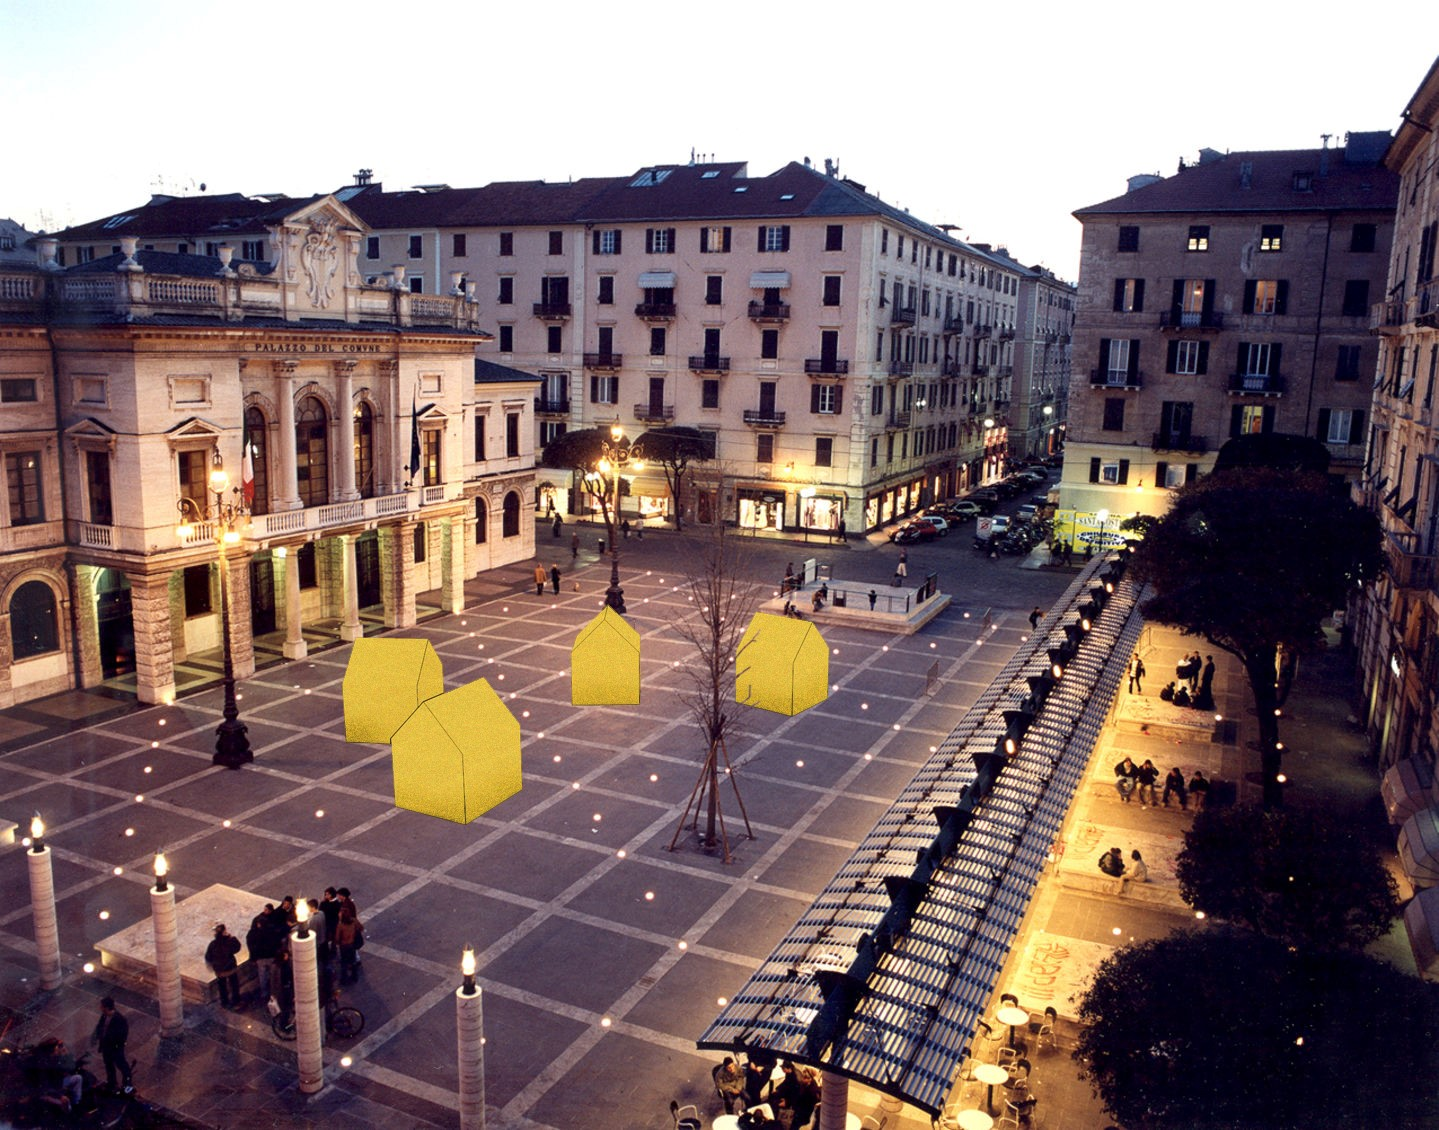 piazza sisto IV